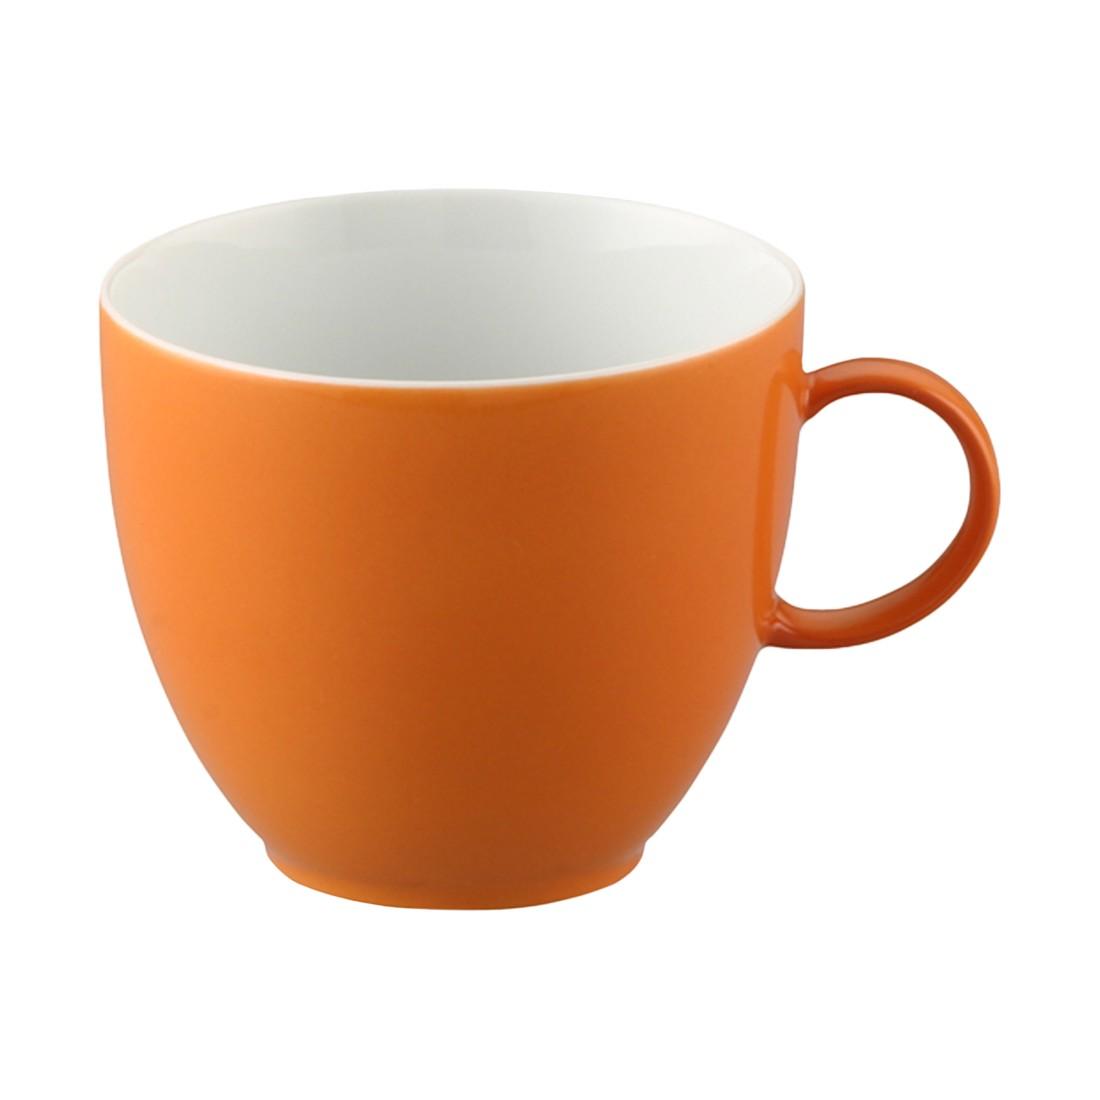 Kaffeetasse Sunny Day – Porzellan Orange, Thomas günstig kaufen